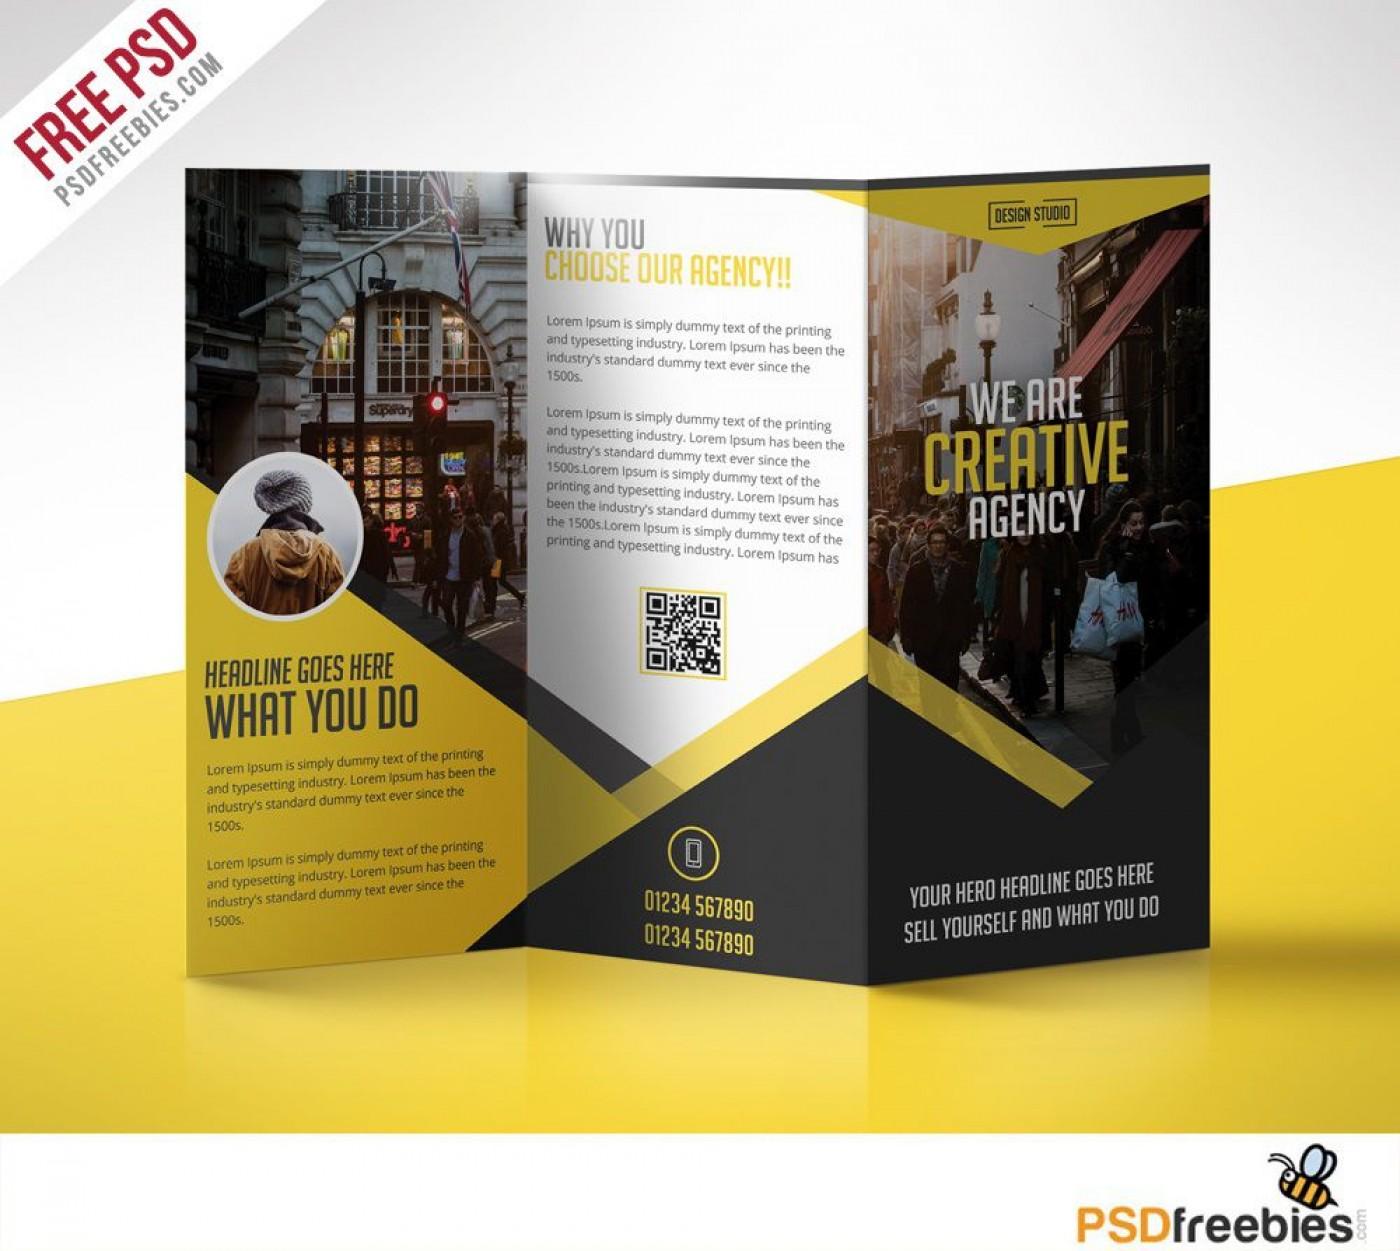 008 Breathtaking Photoshop Brochure Design Template Free Download Photo 1400